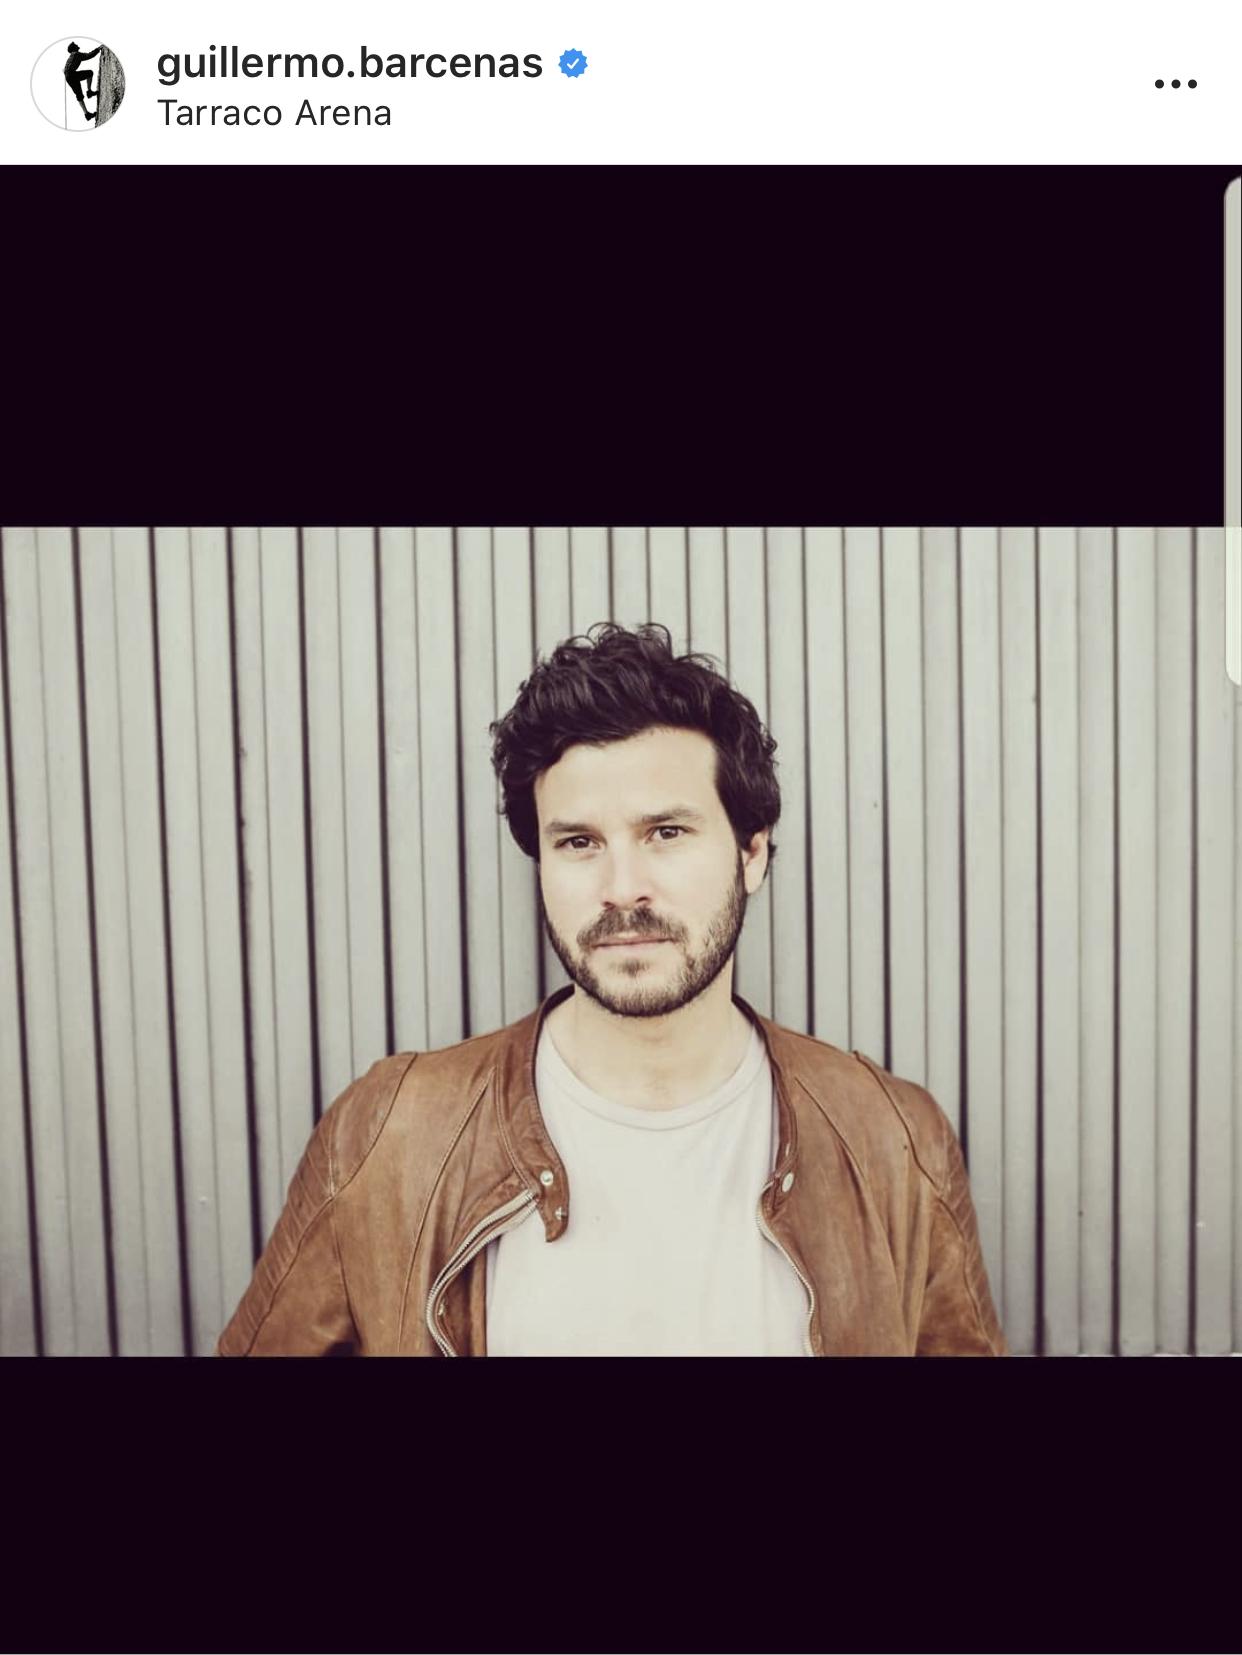 Guillermo Bárcenas / Instagram